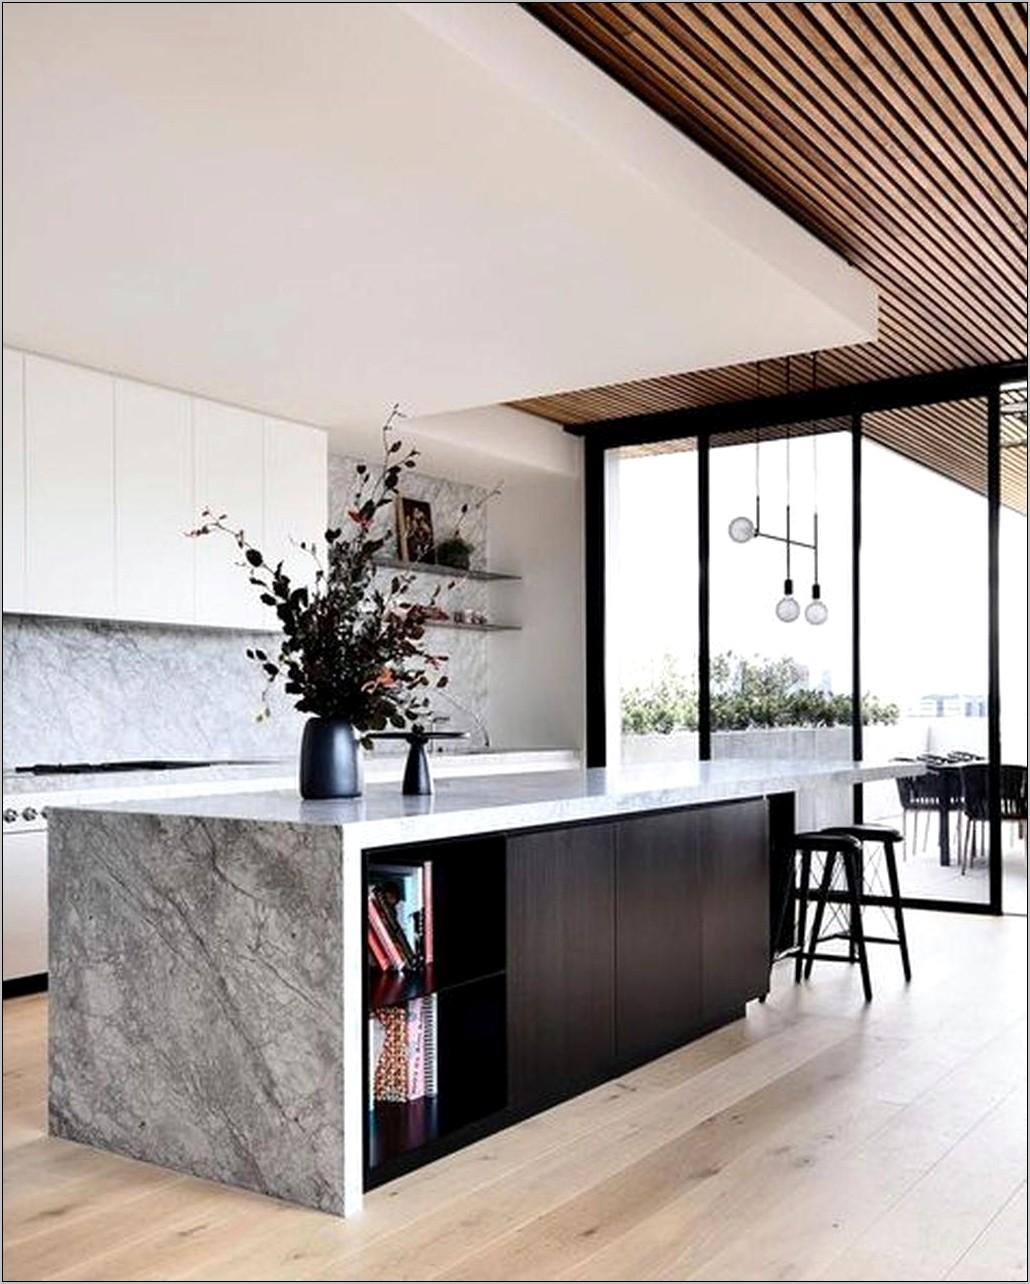 Western Kitchen Decor Themes